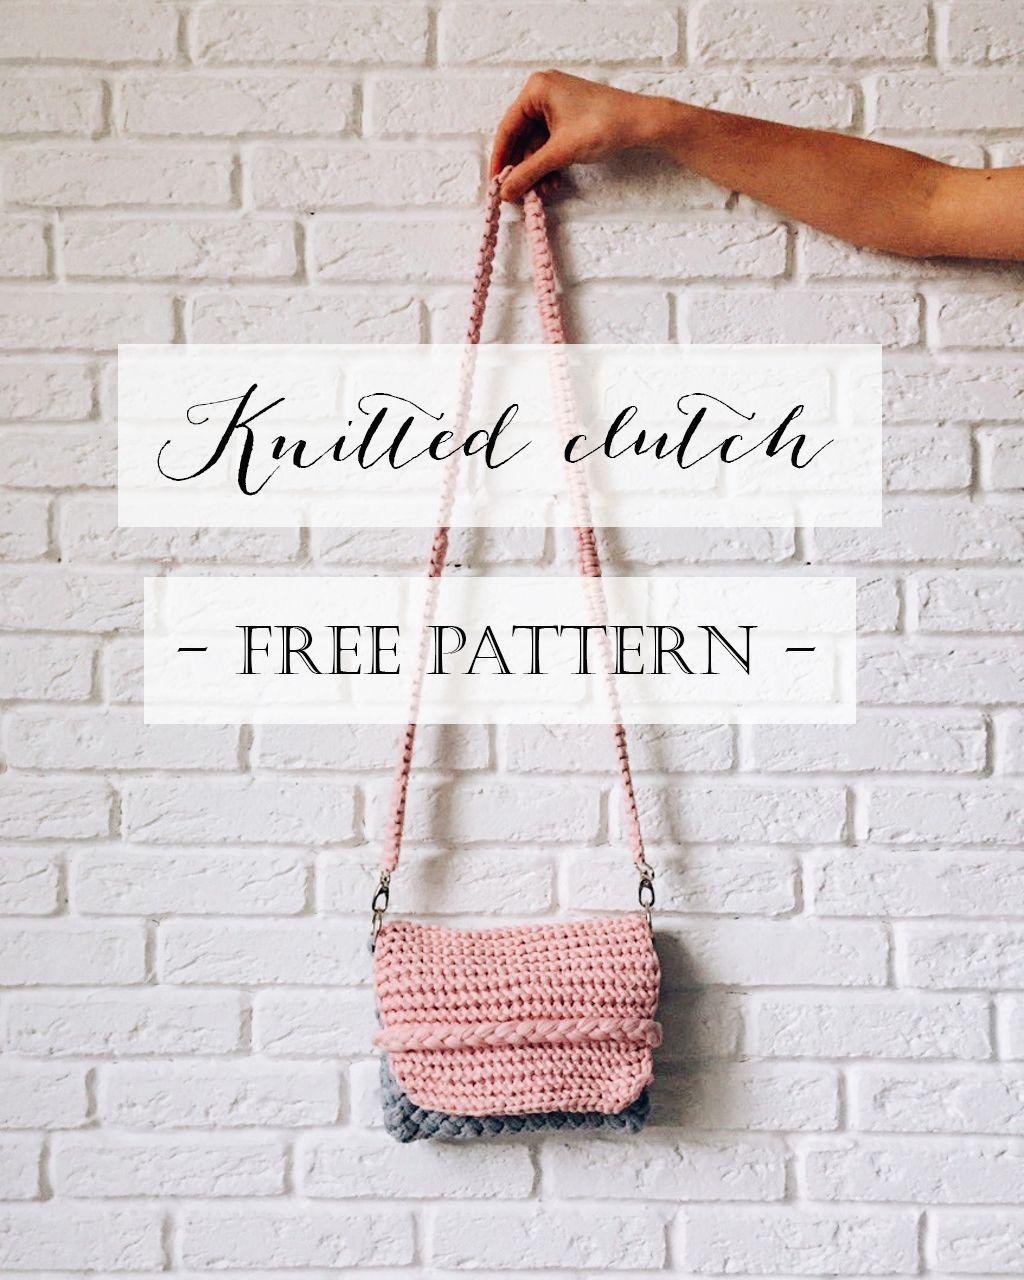 knitted clutch - free pattern | carteras infantiles | Pinterest ...